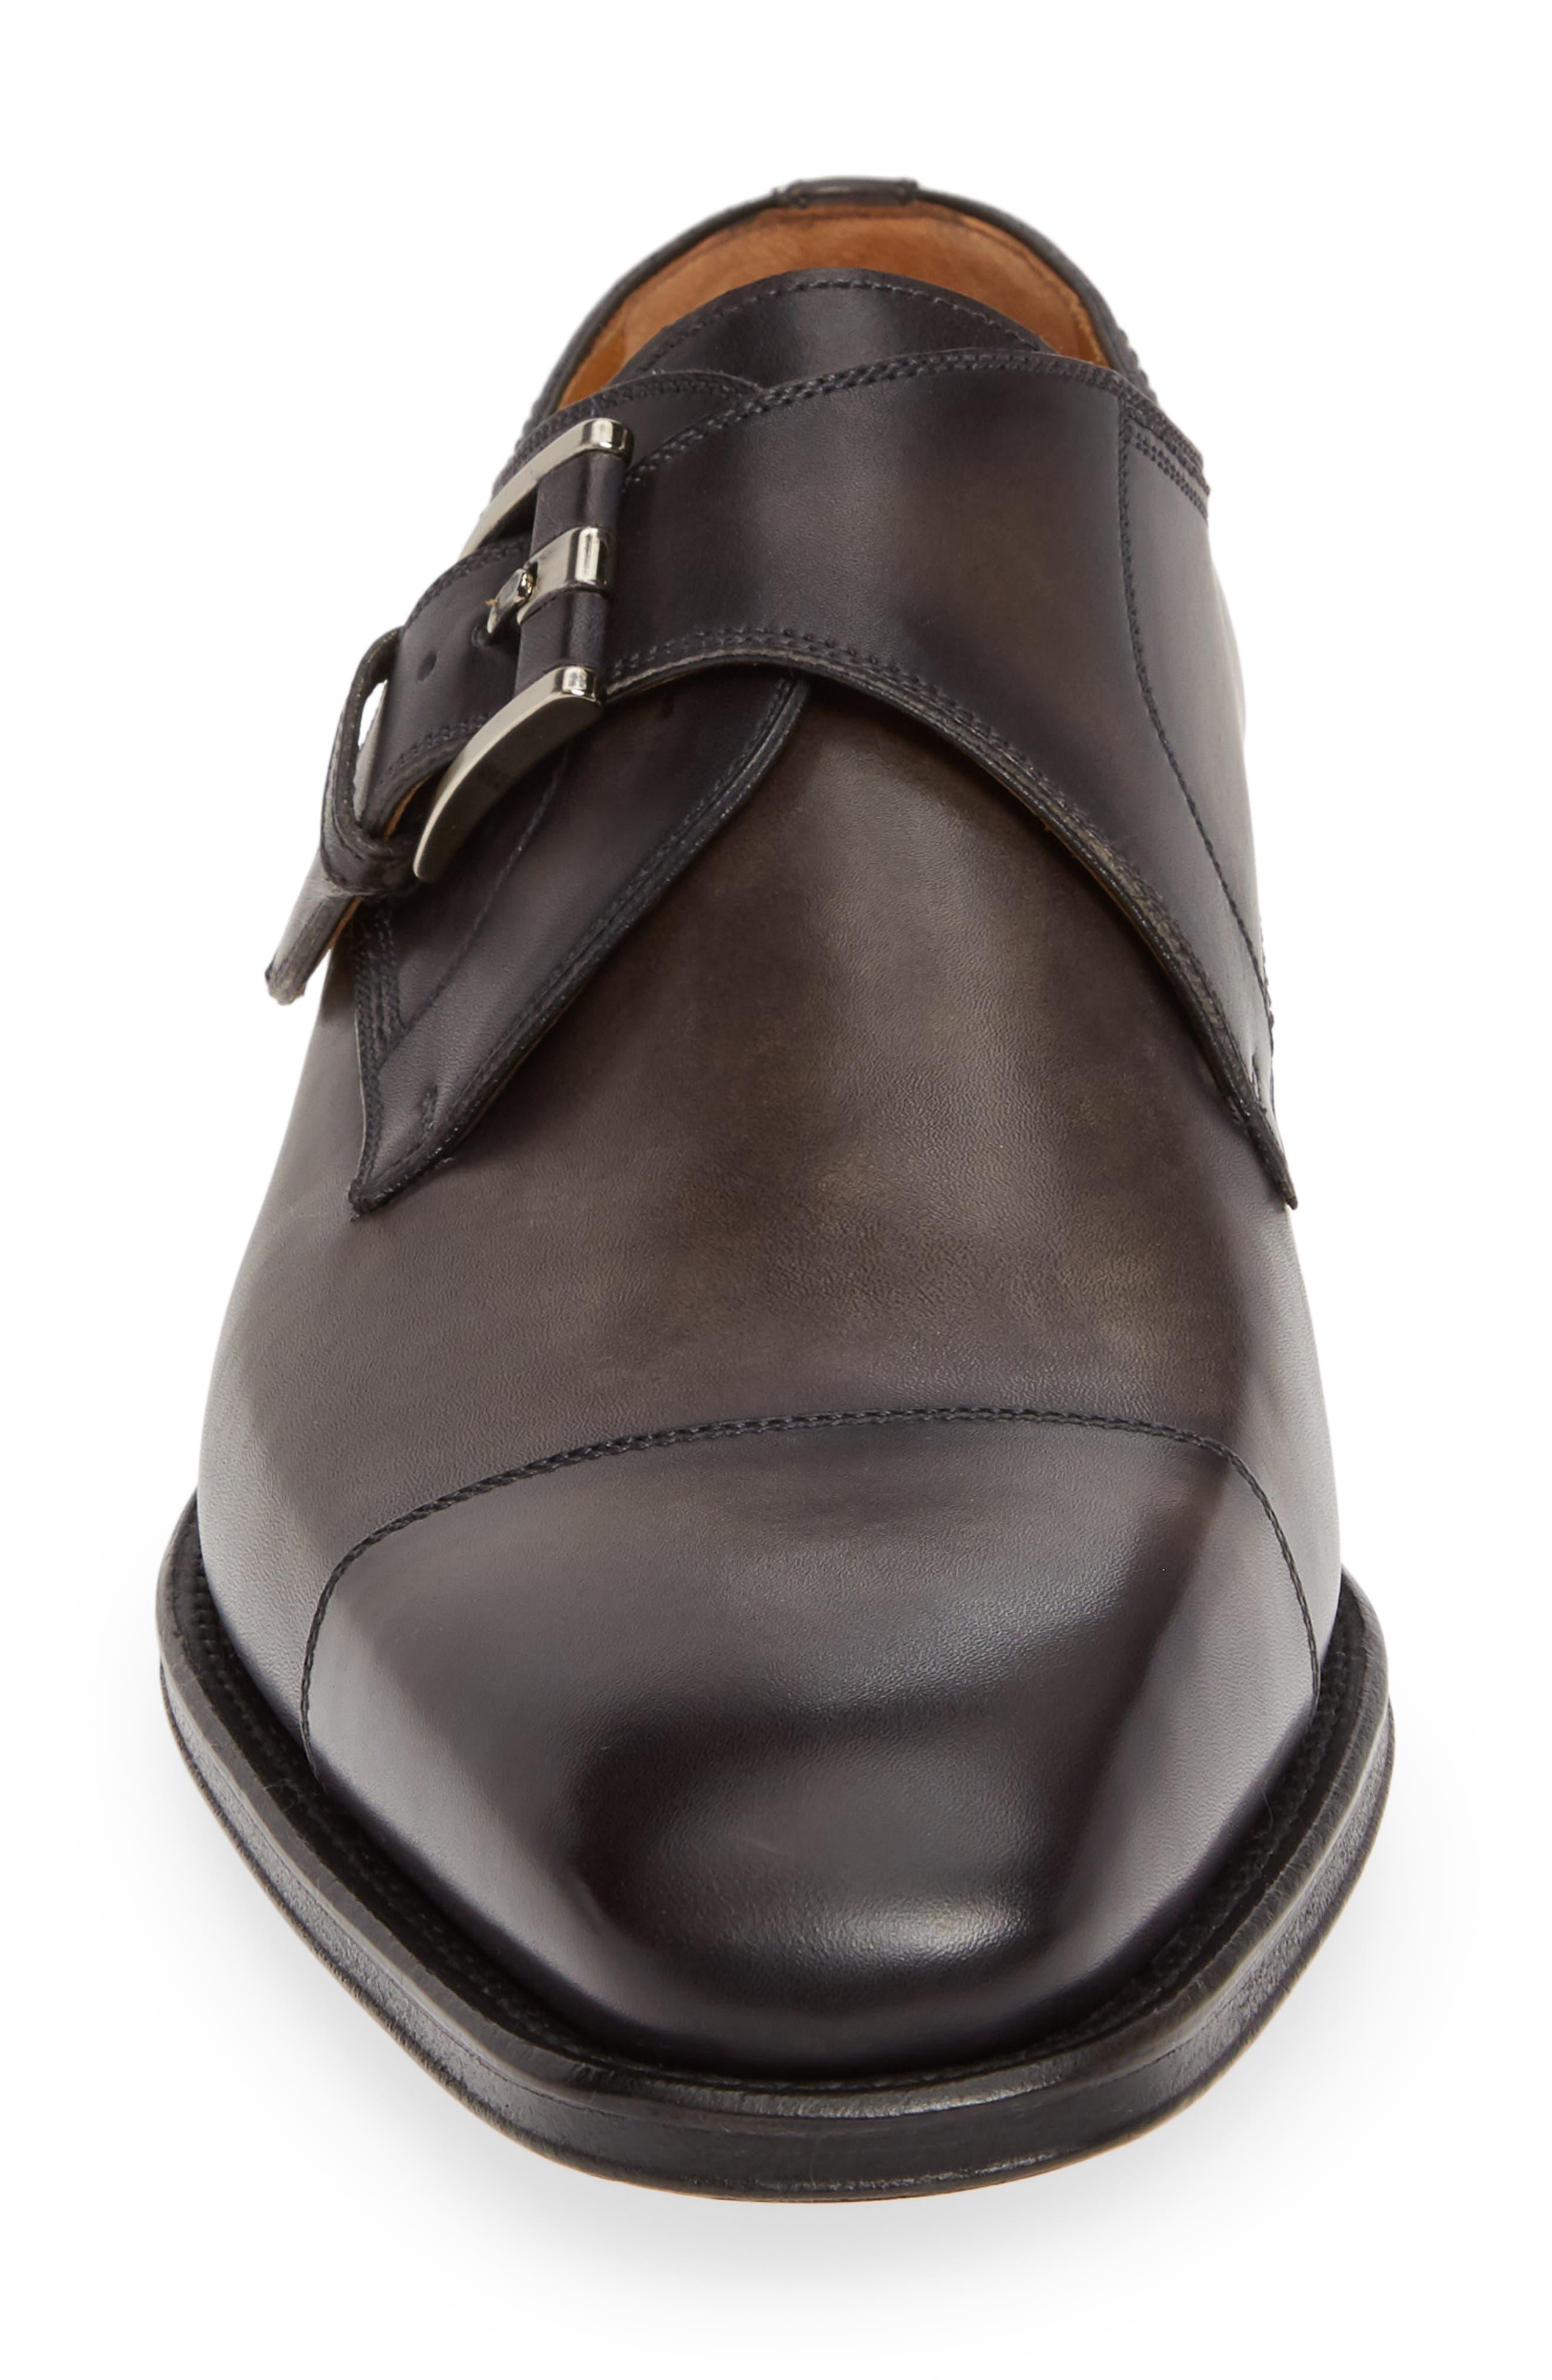 MAGNANNI,                             Lennon Monk Strap Shoe,                             Alternate thumbnail 4, color,                             GREY LEATHER